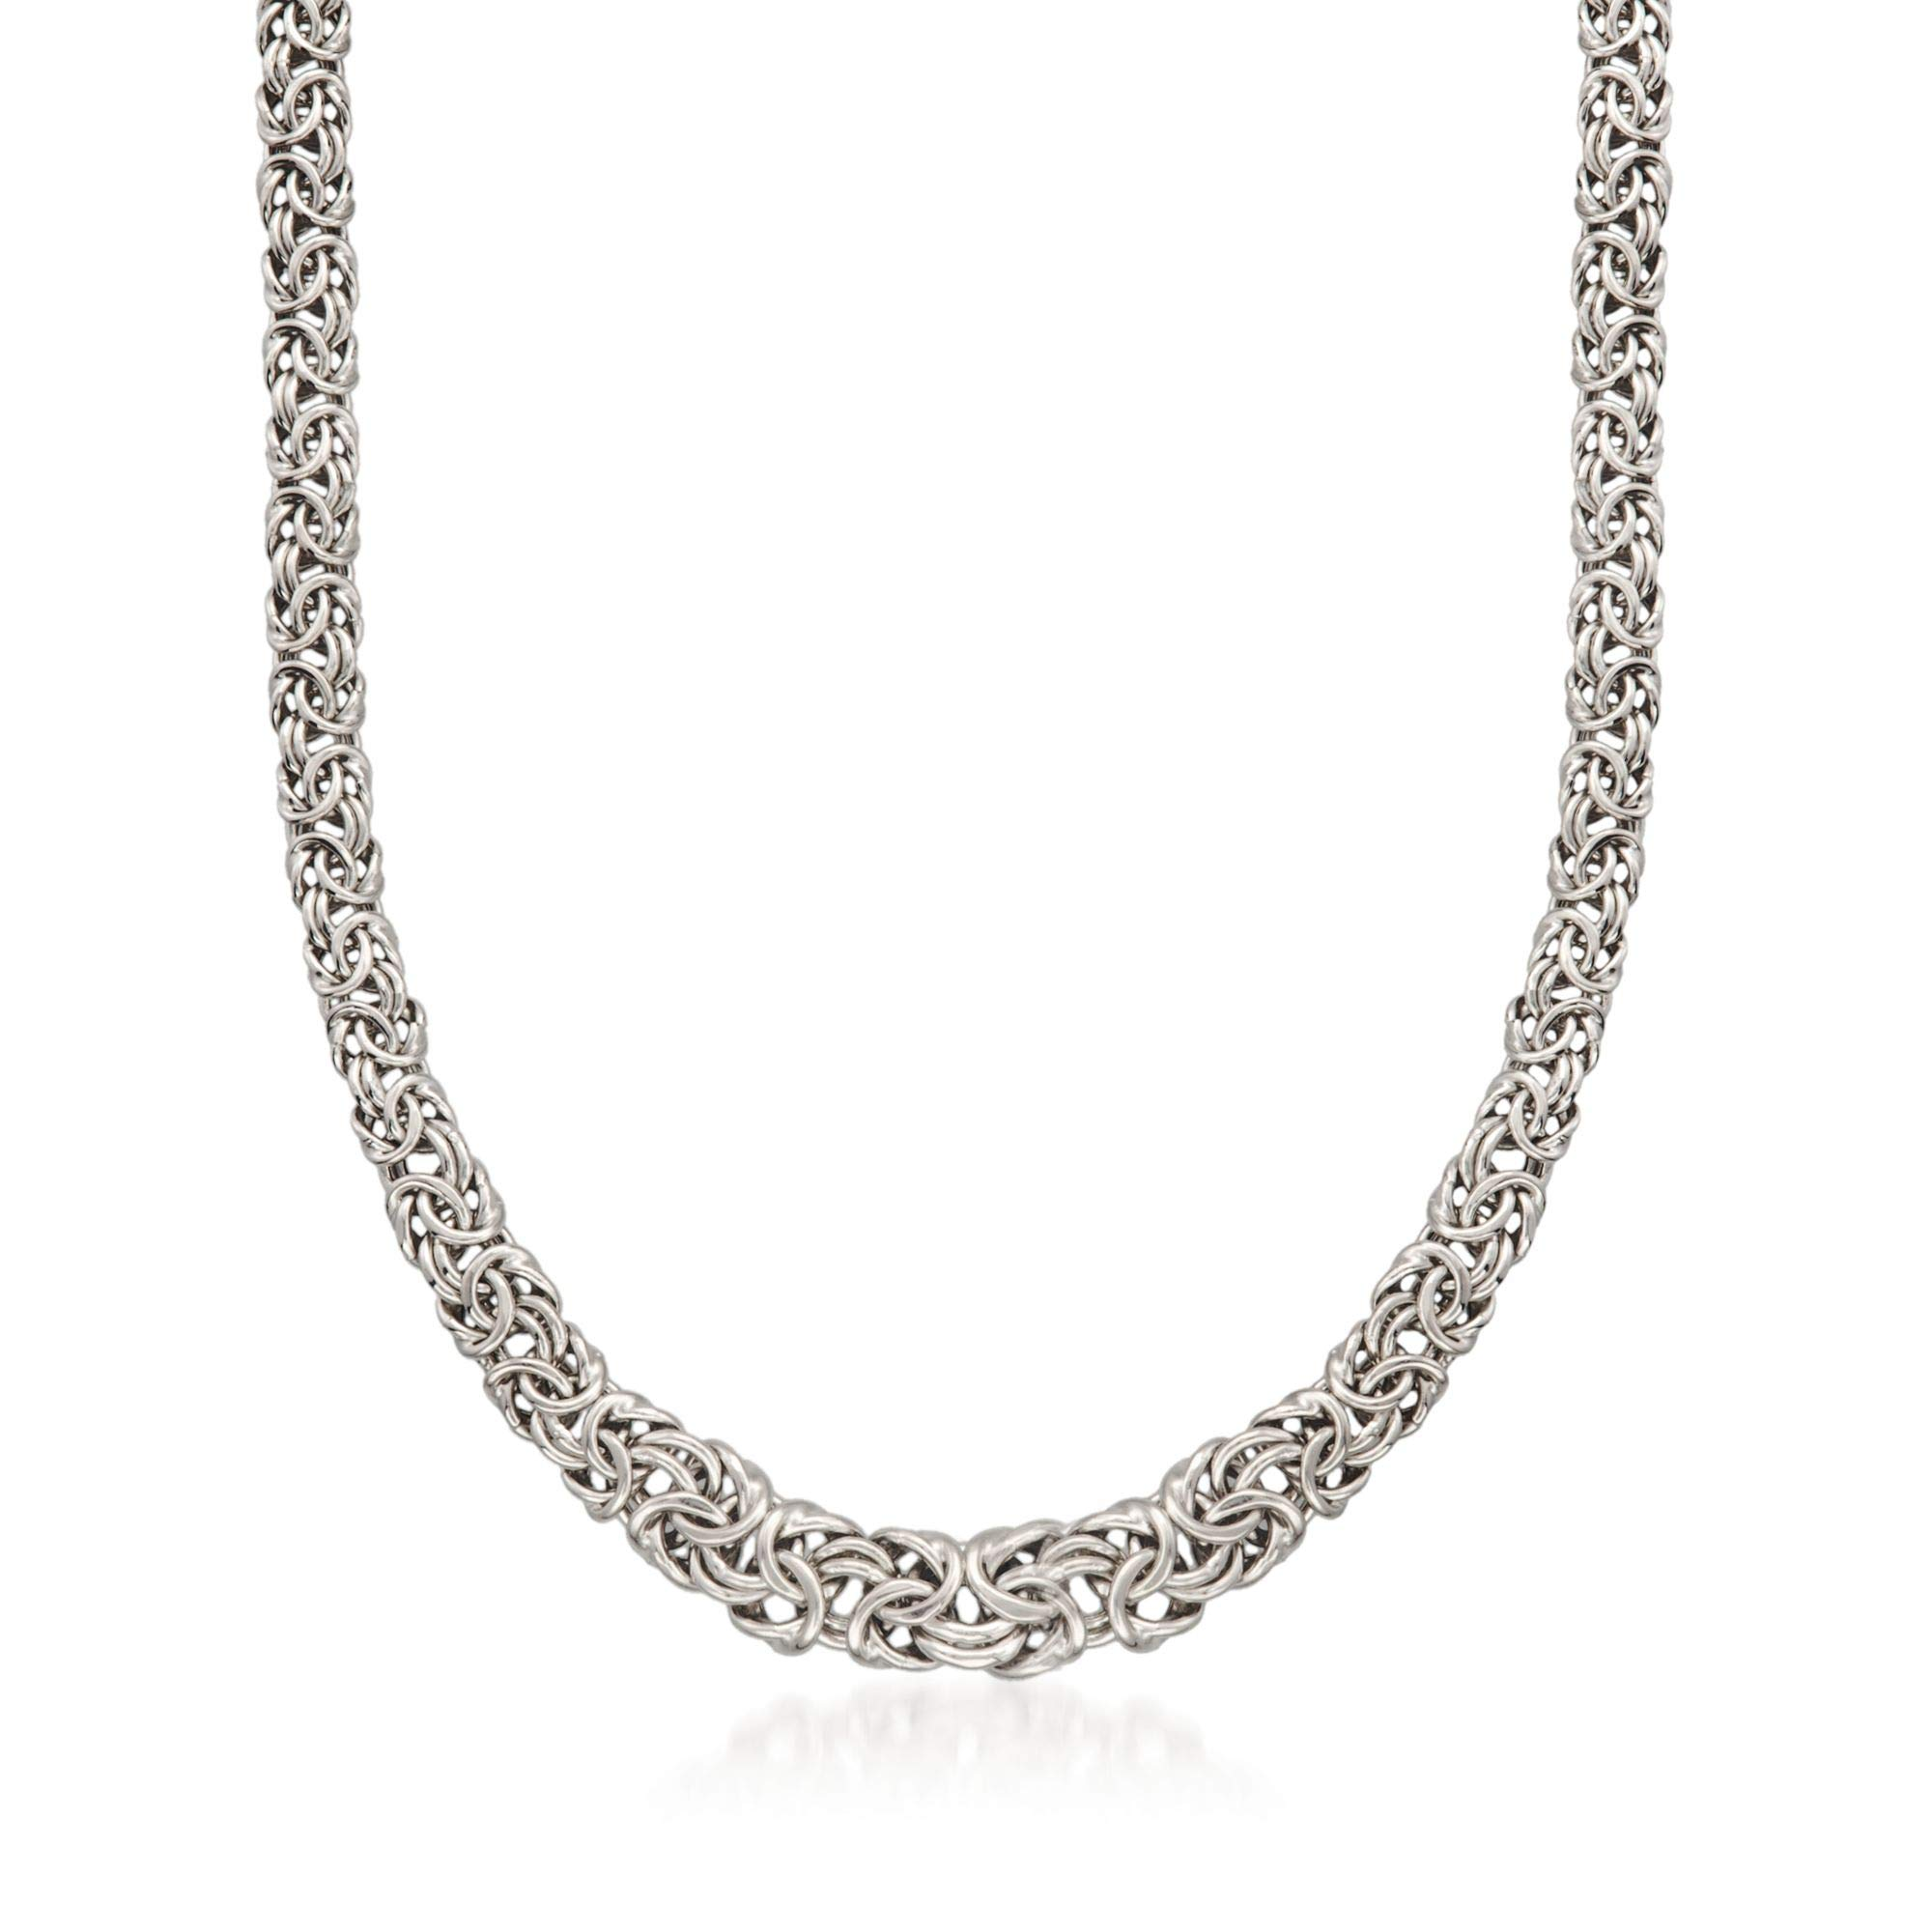 e3398e708fb89 Ross-Simons Italian Sterling Silver Graduated Byzantine Necklace